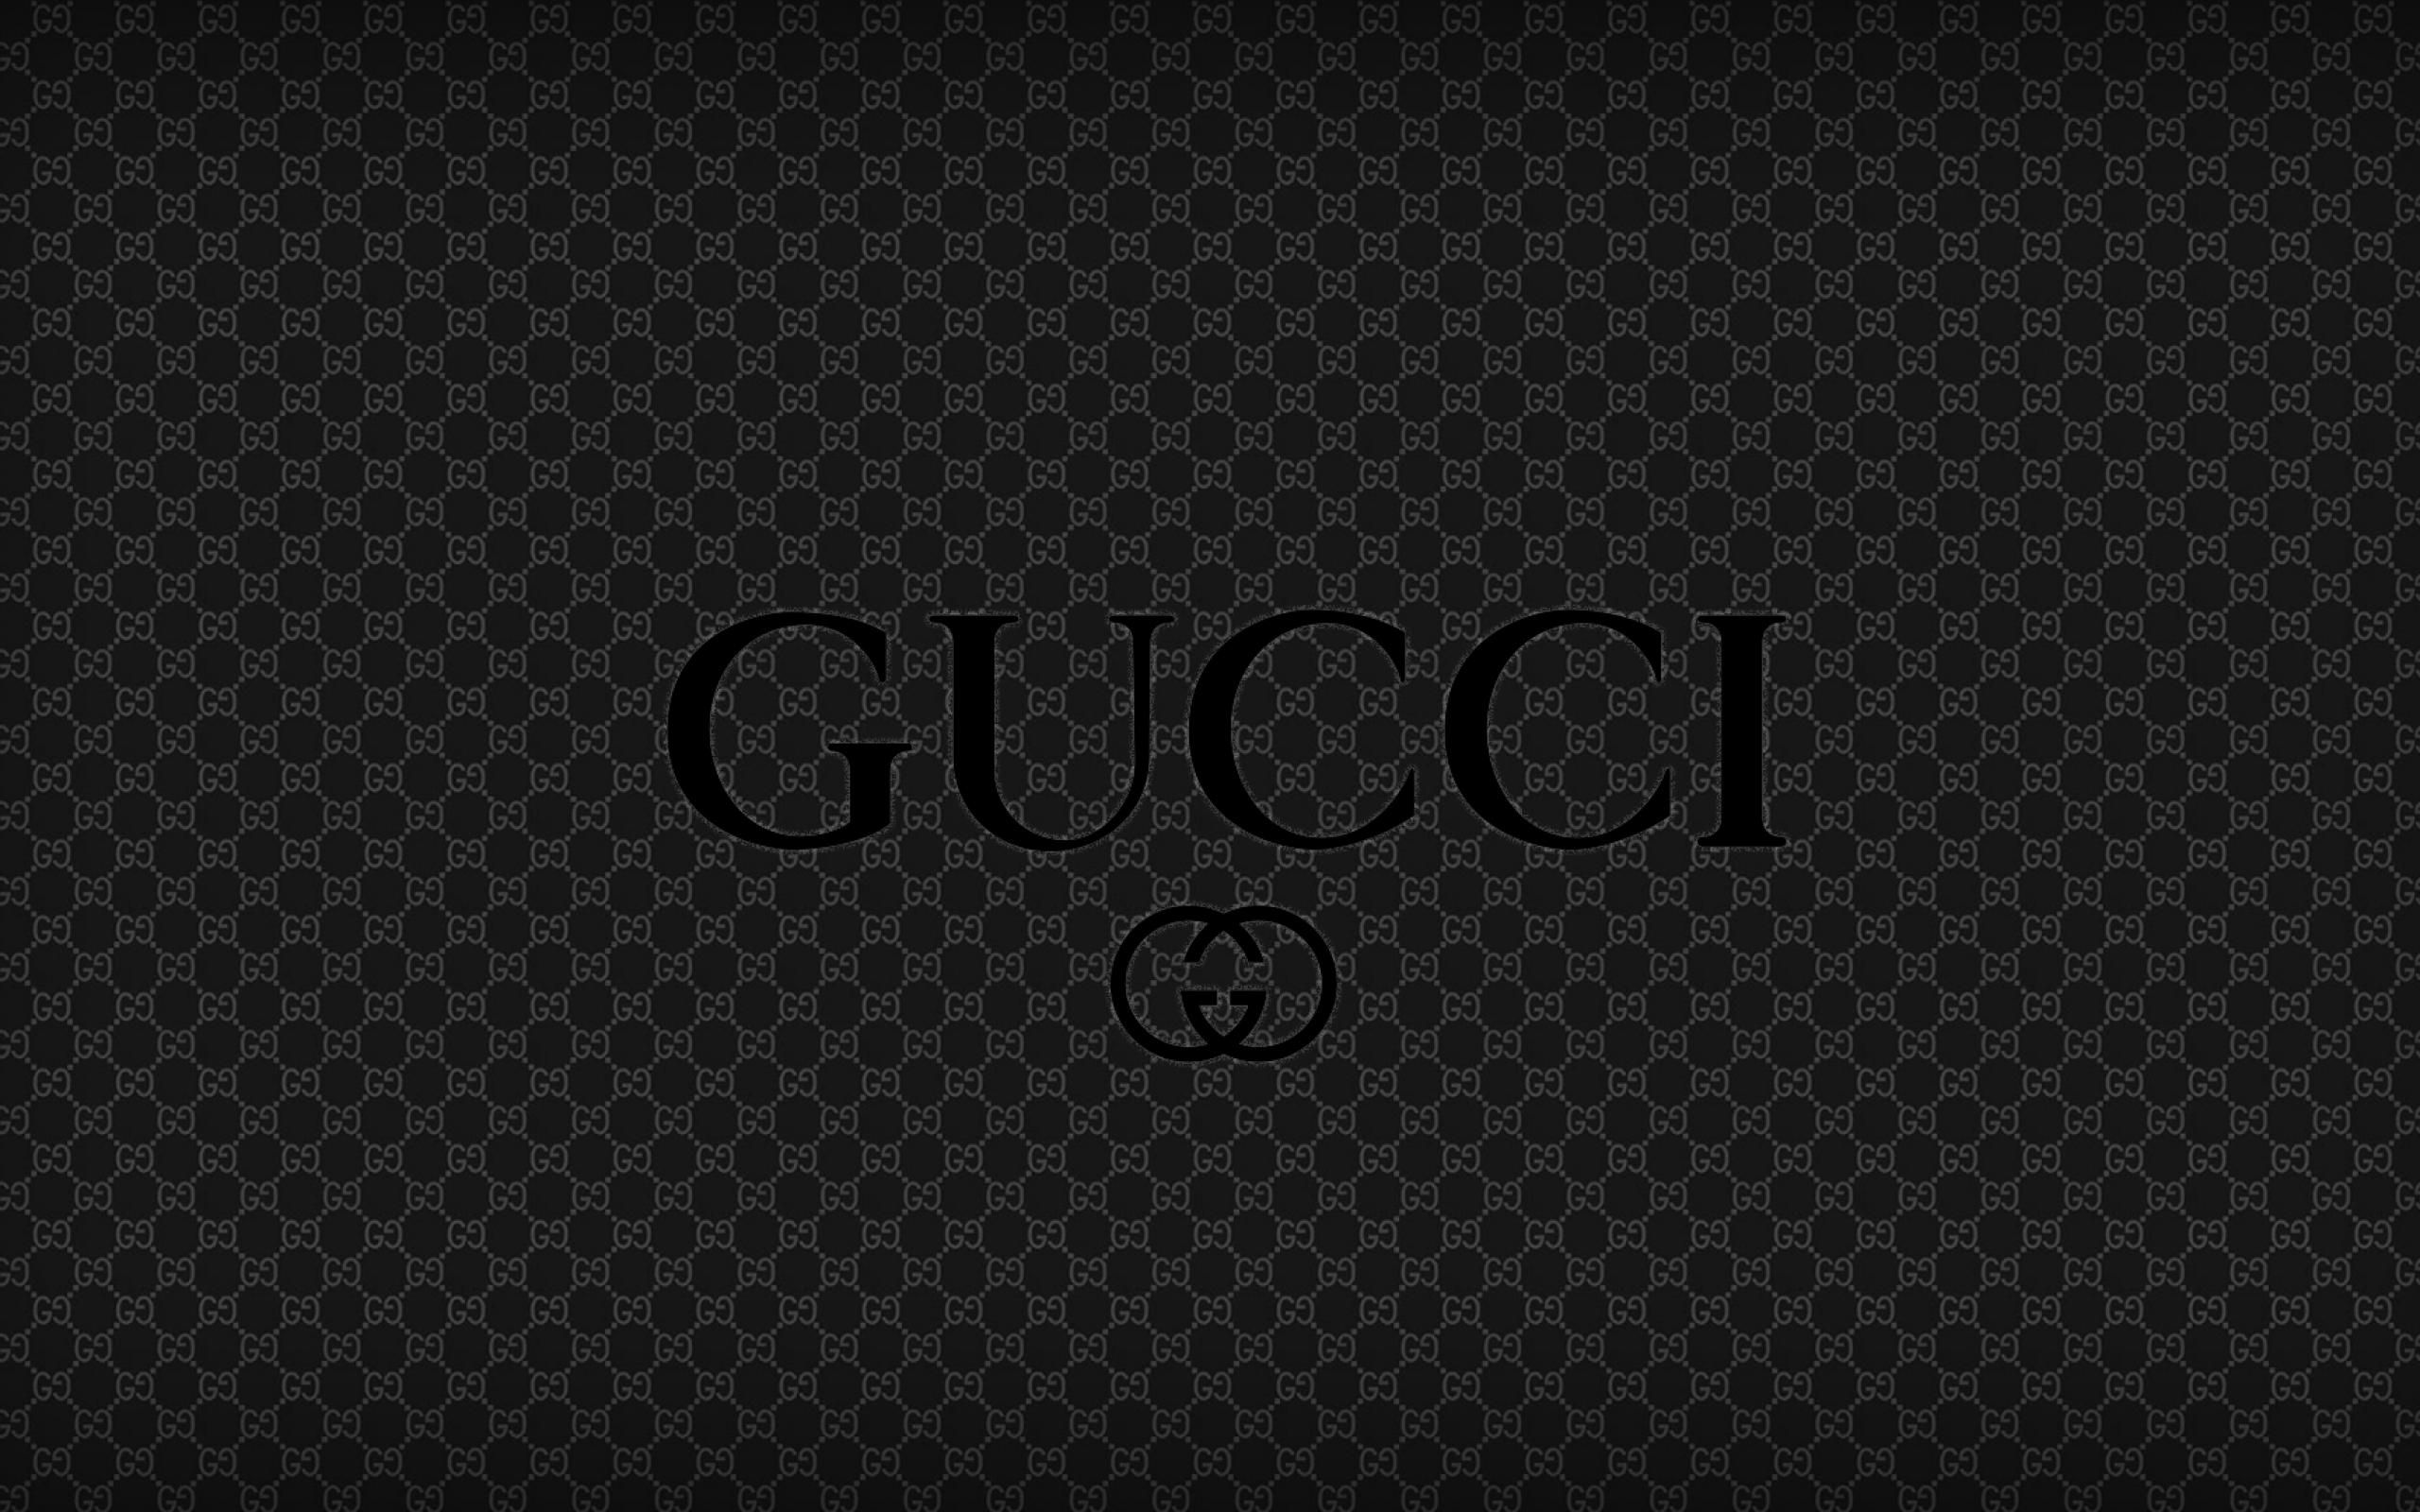 Gucci Logo Wallpaper Hd Iphone Gucci Logo Wallpapers Wallpaper Cave Gucci Wallpaper Iphone Gucci Logo Wallpaper Hd Gucci full hd wallpaper